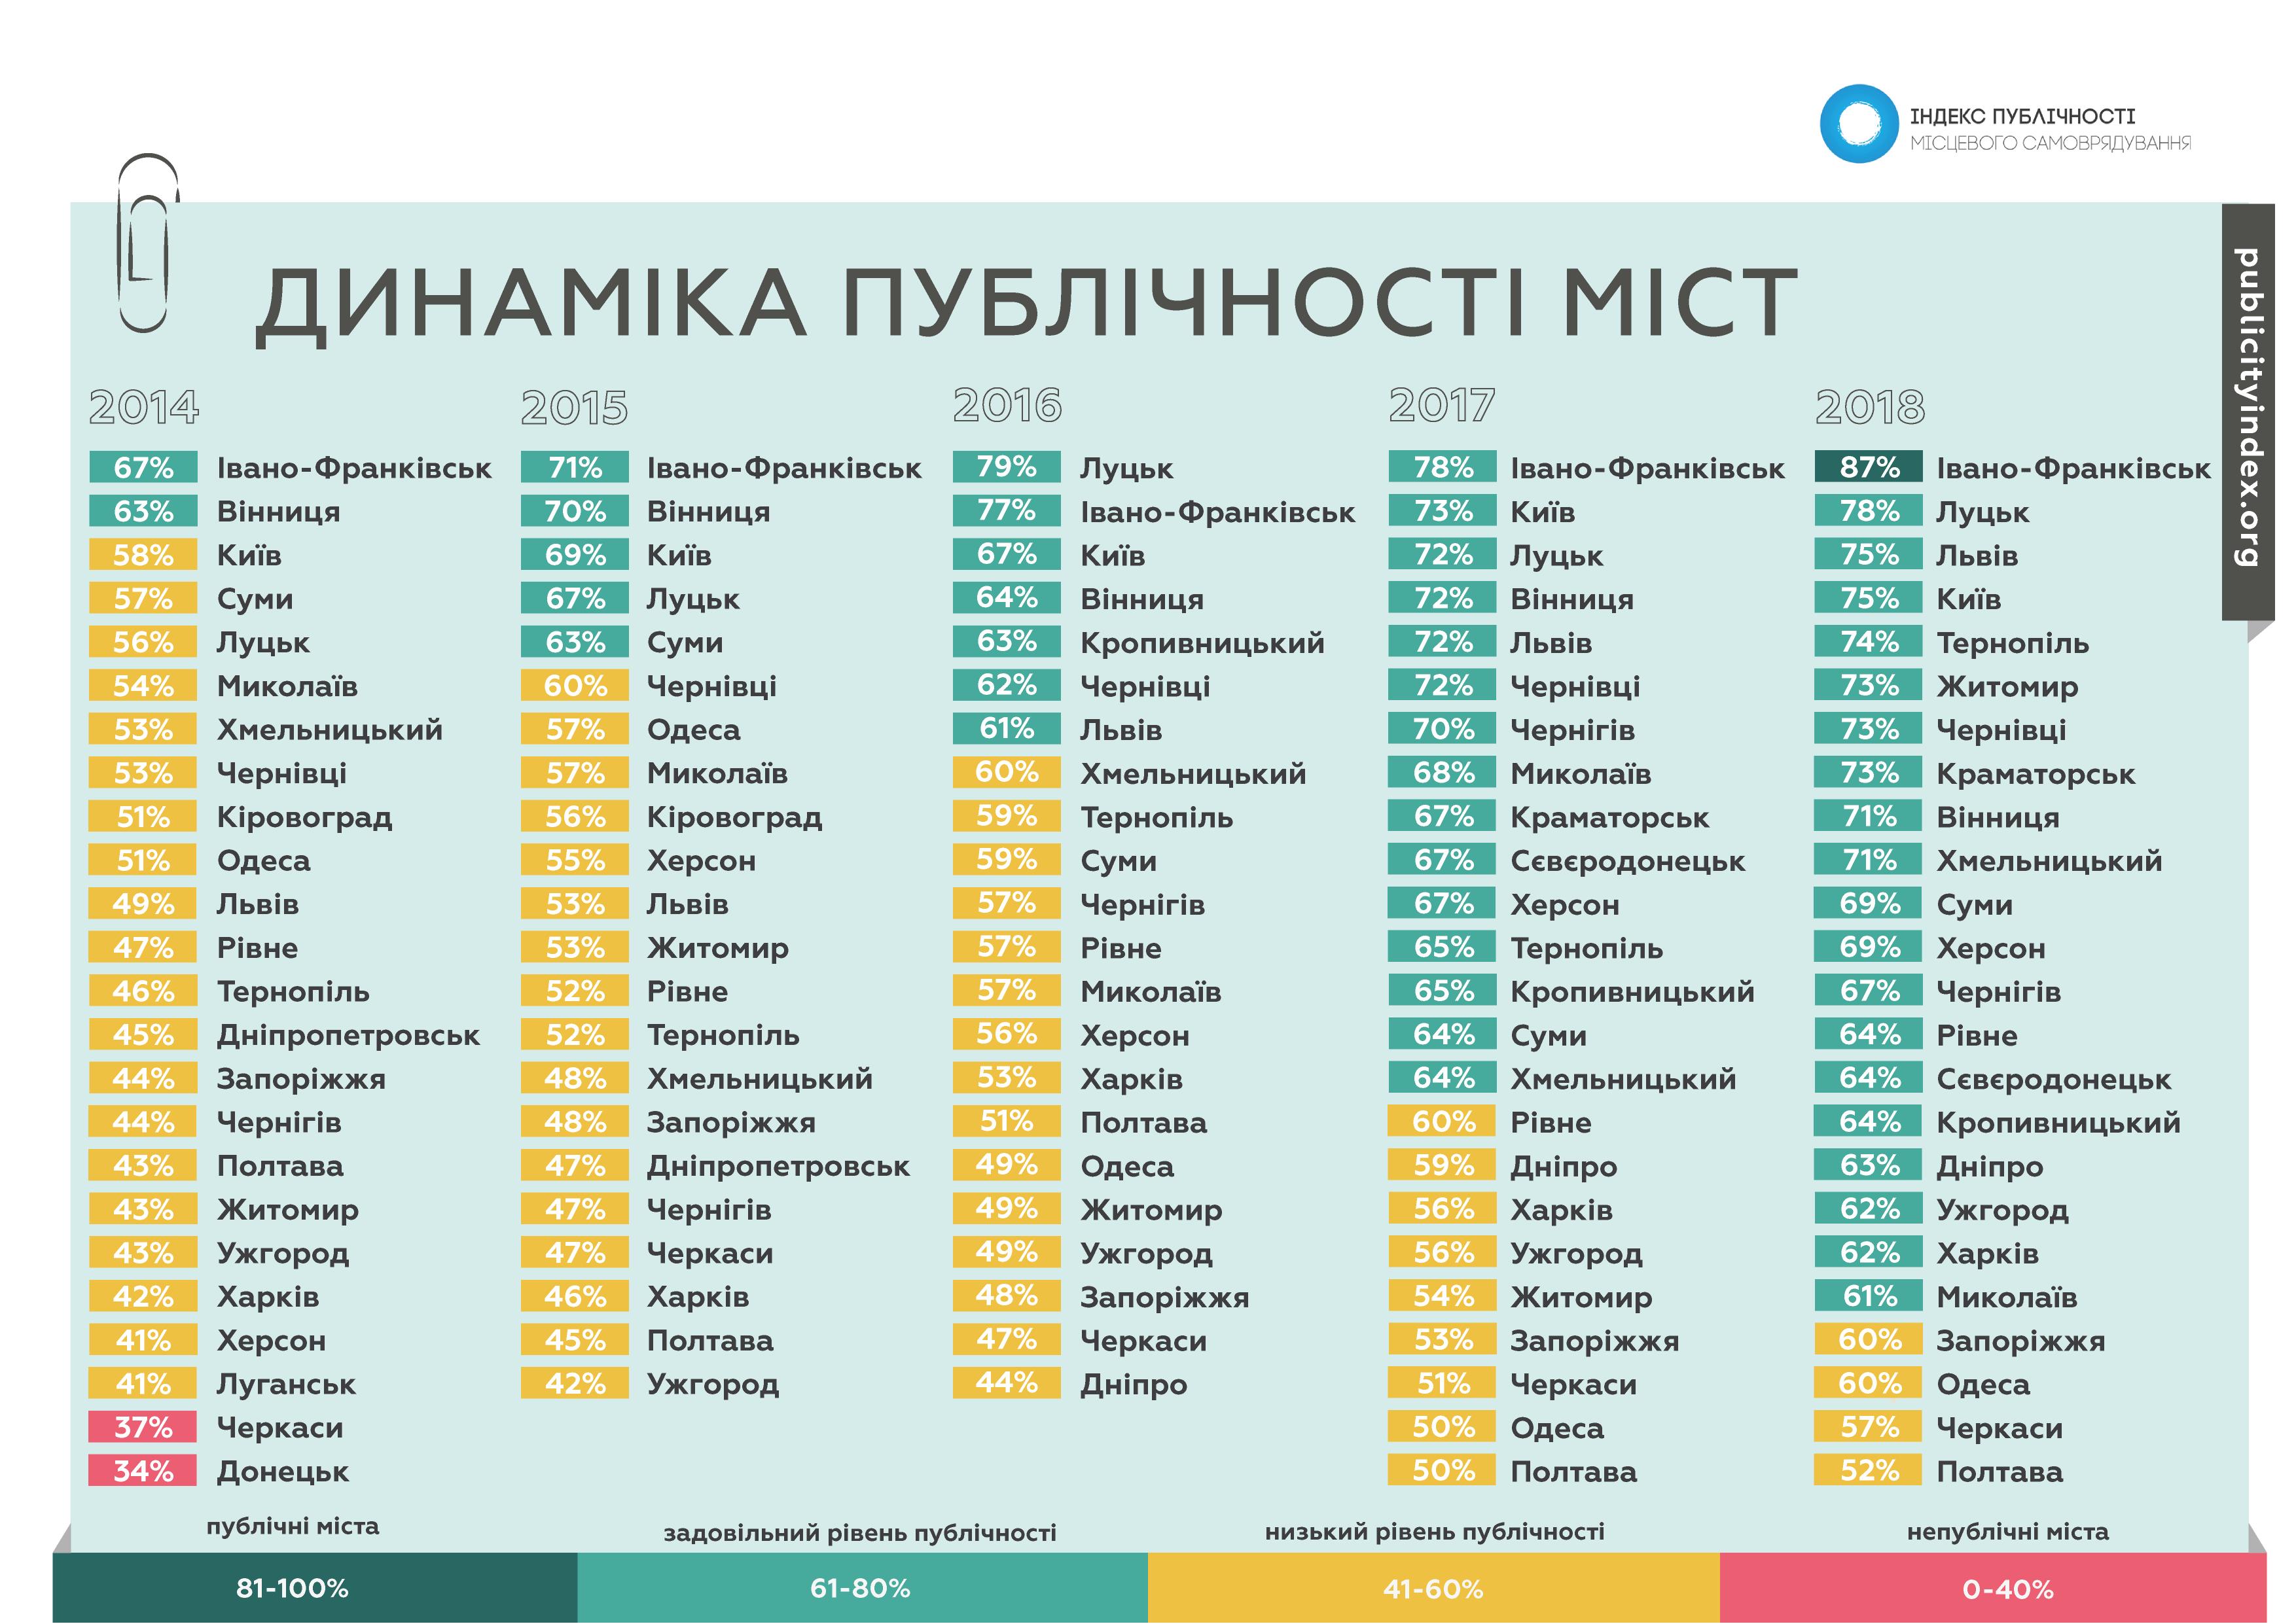 https://galka.if.ua/app/uploads/2019/10/Opora_Indeks_publichnosti_-03.png